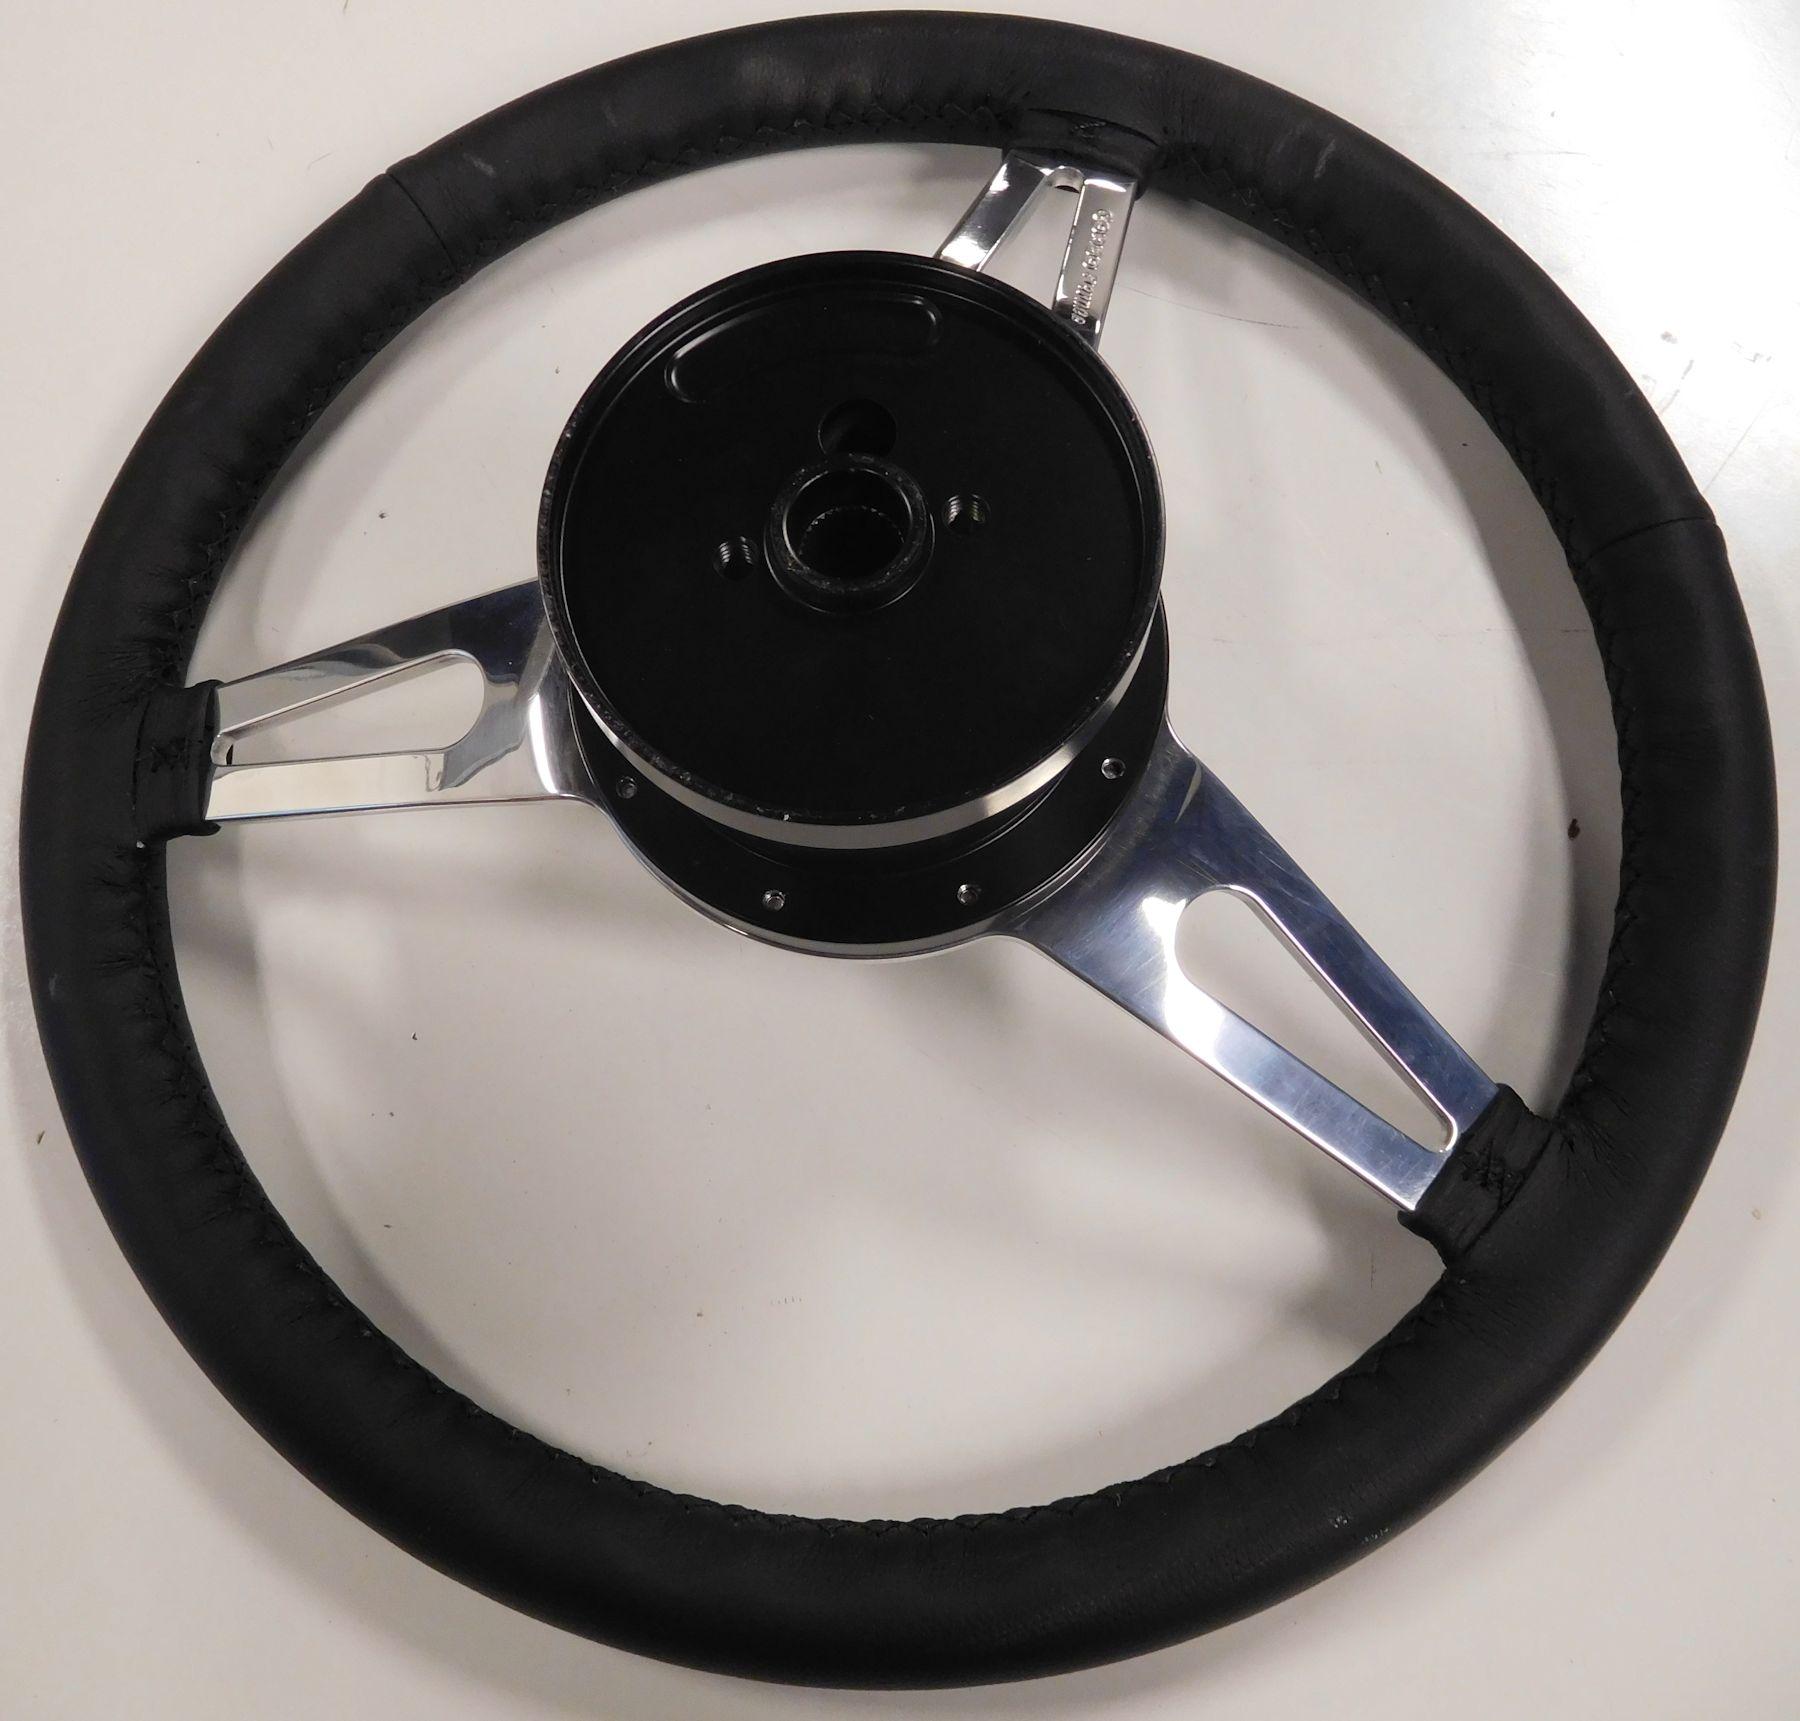 Gen Ii Stack Up Tilt together with C C together with Exterior Color together with Steeringwheel besides E. on 1966 ford bronco steering column horn on